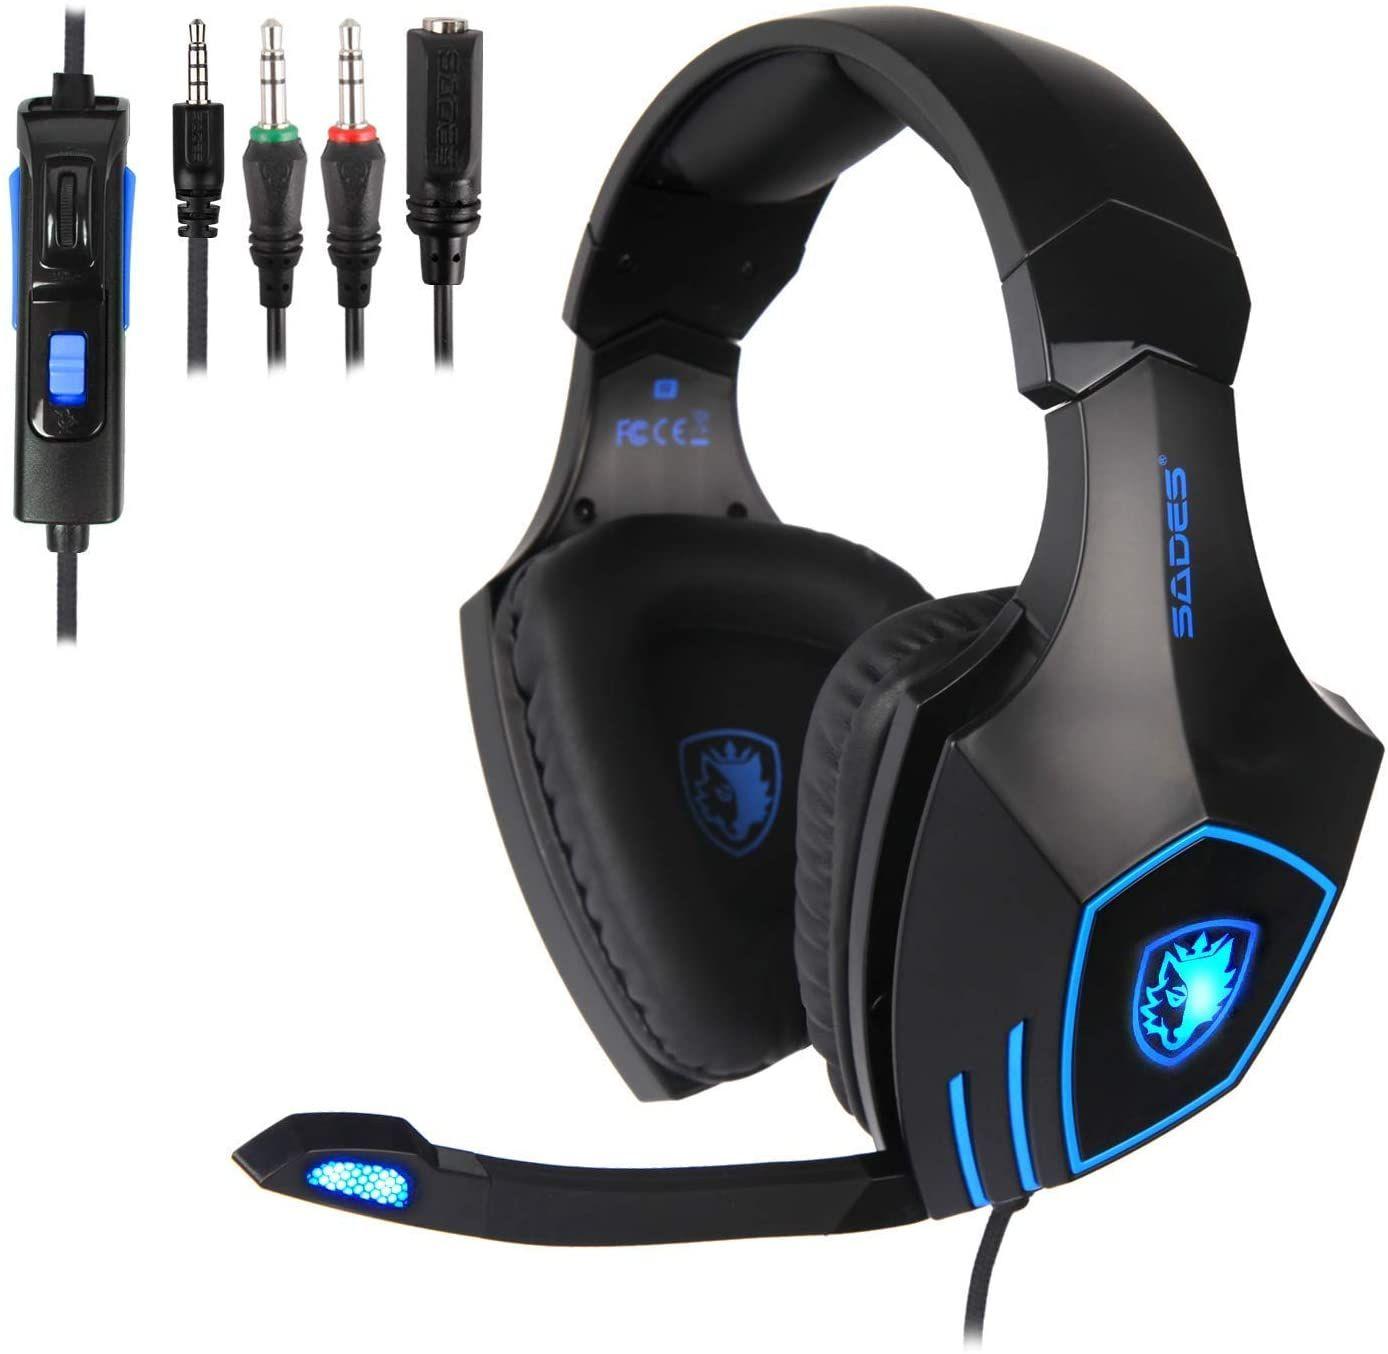 Best Gaming Headsets Under 30 Dollars Best Gaming Headset Headset Gaming Headset